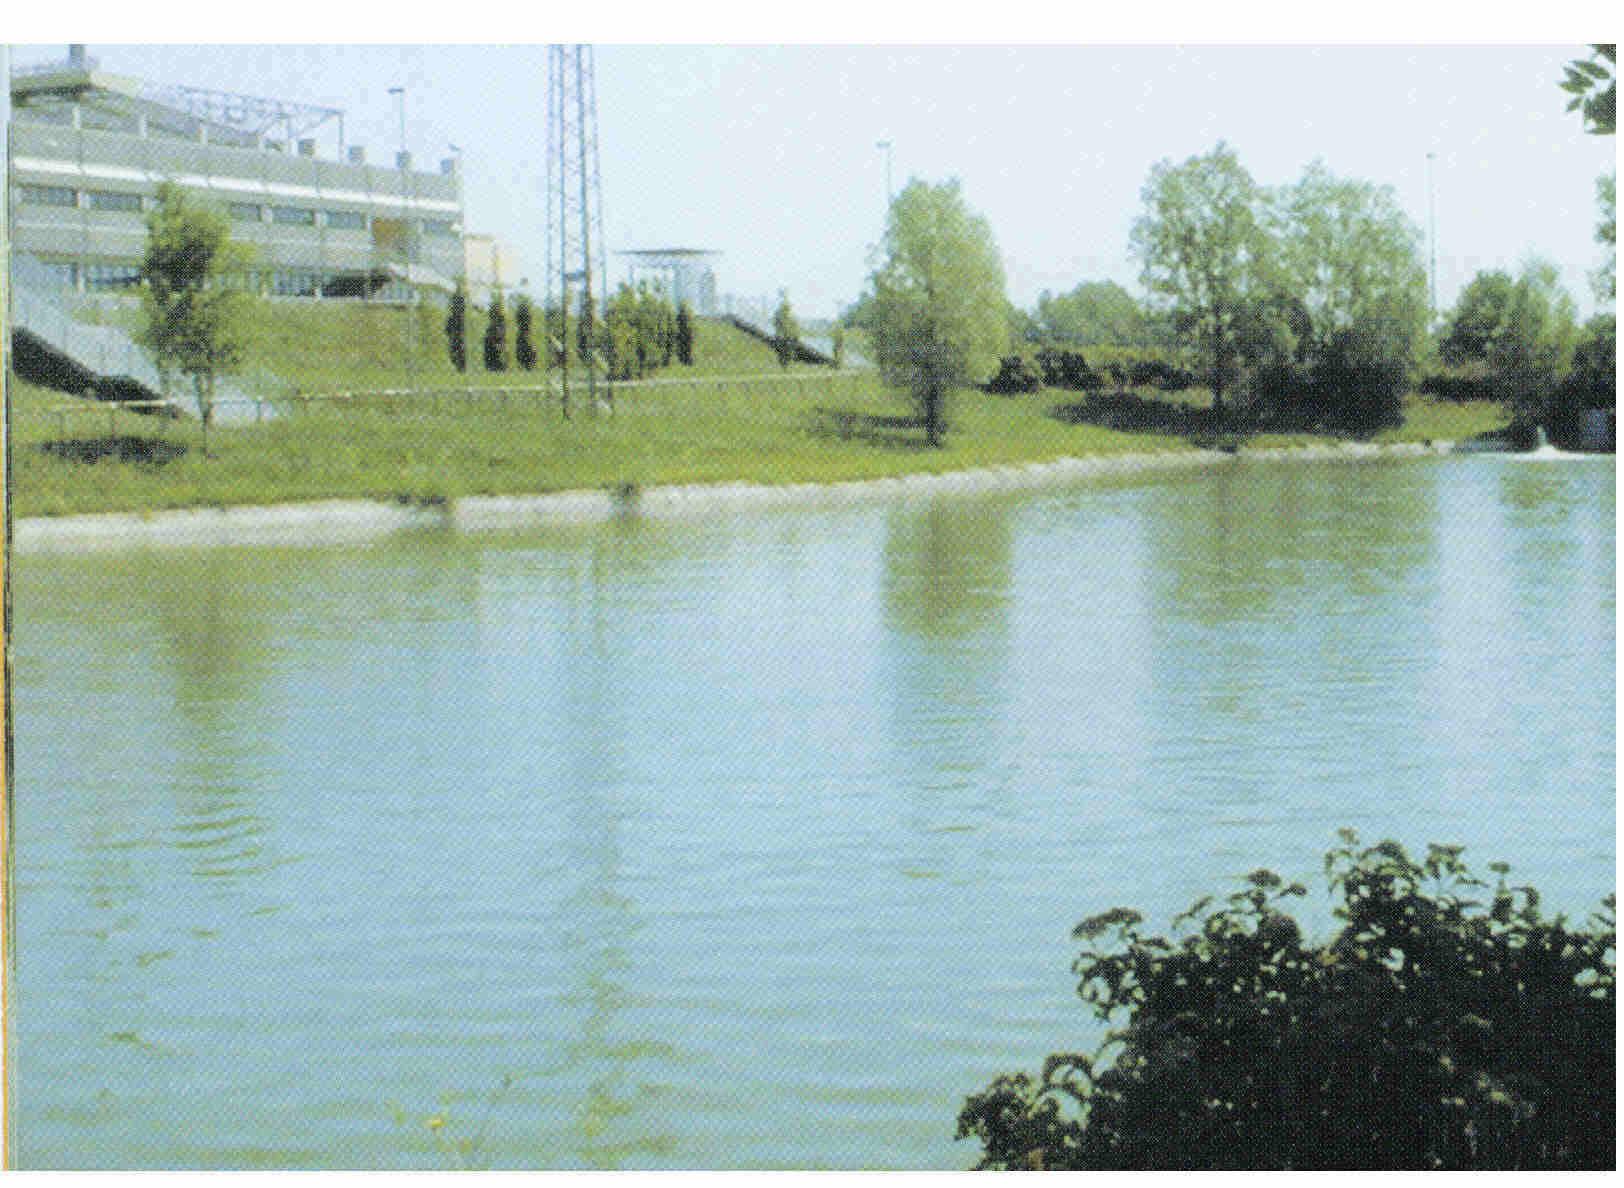 Lago fipsas euganeo for Lago padova